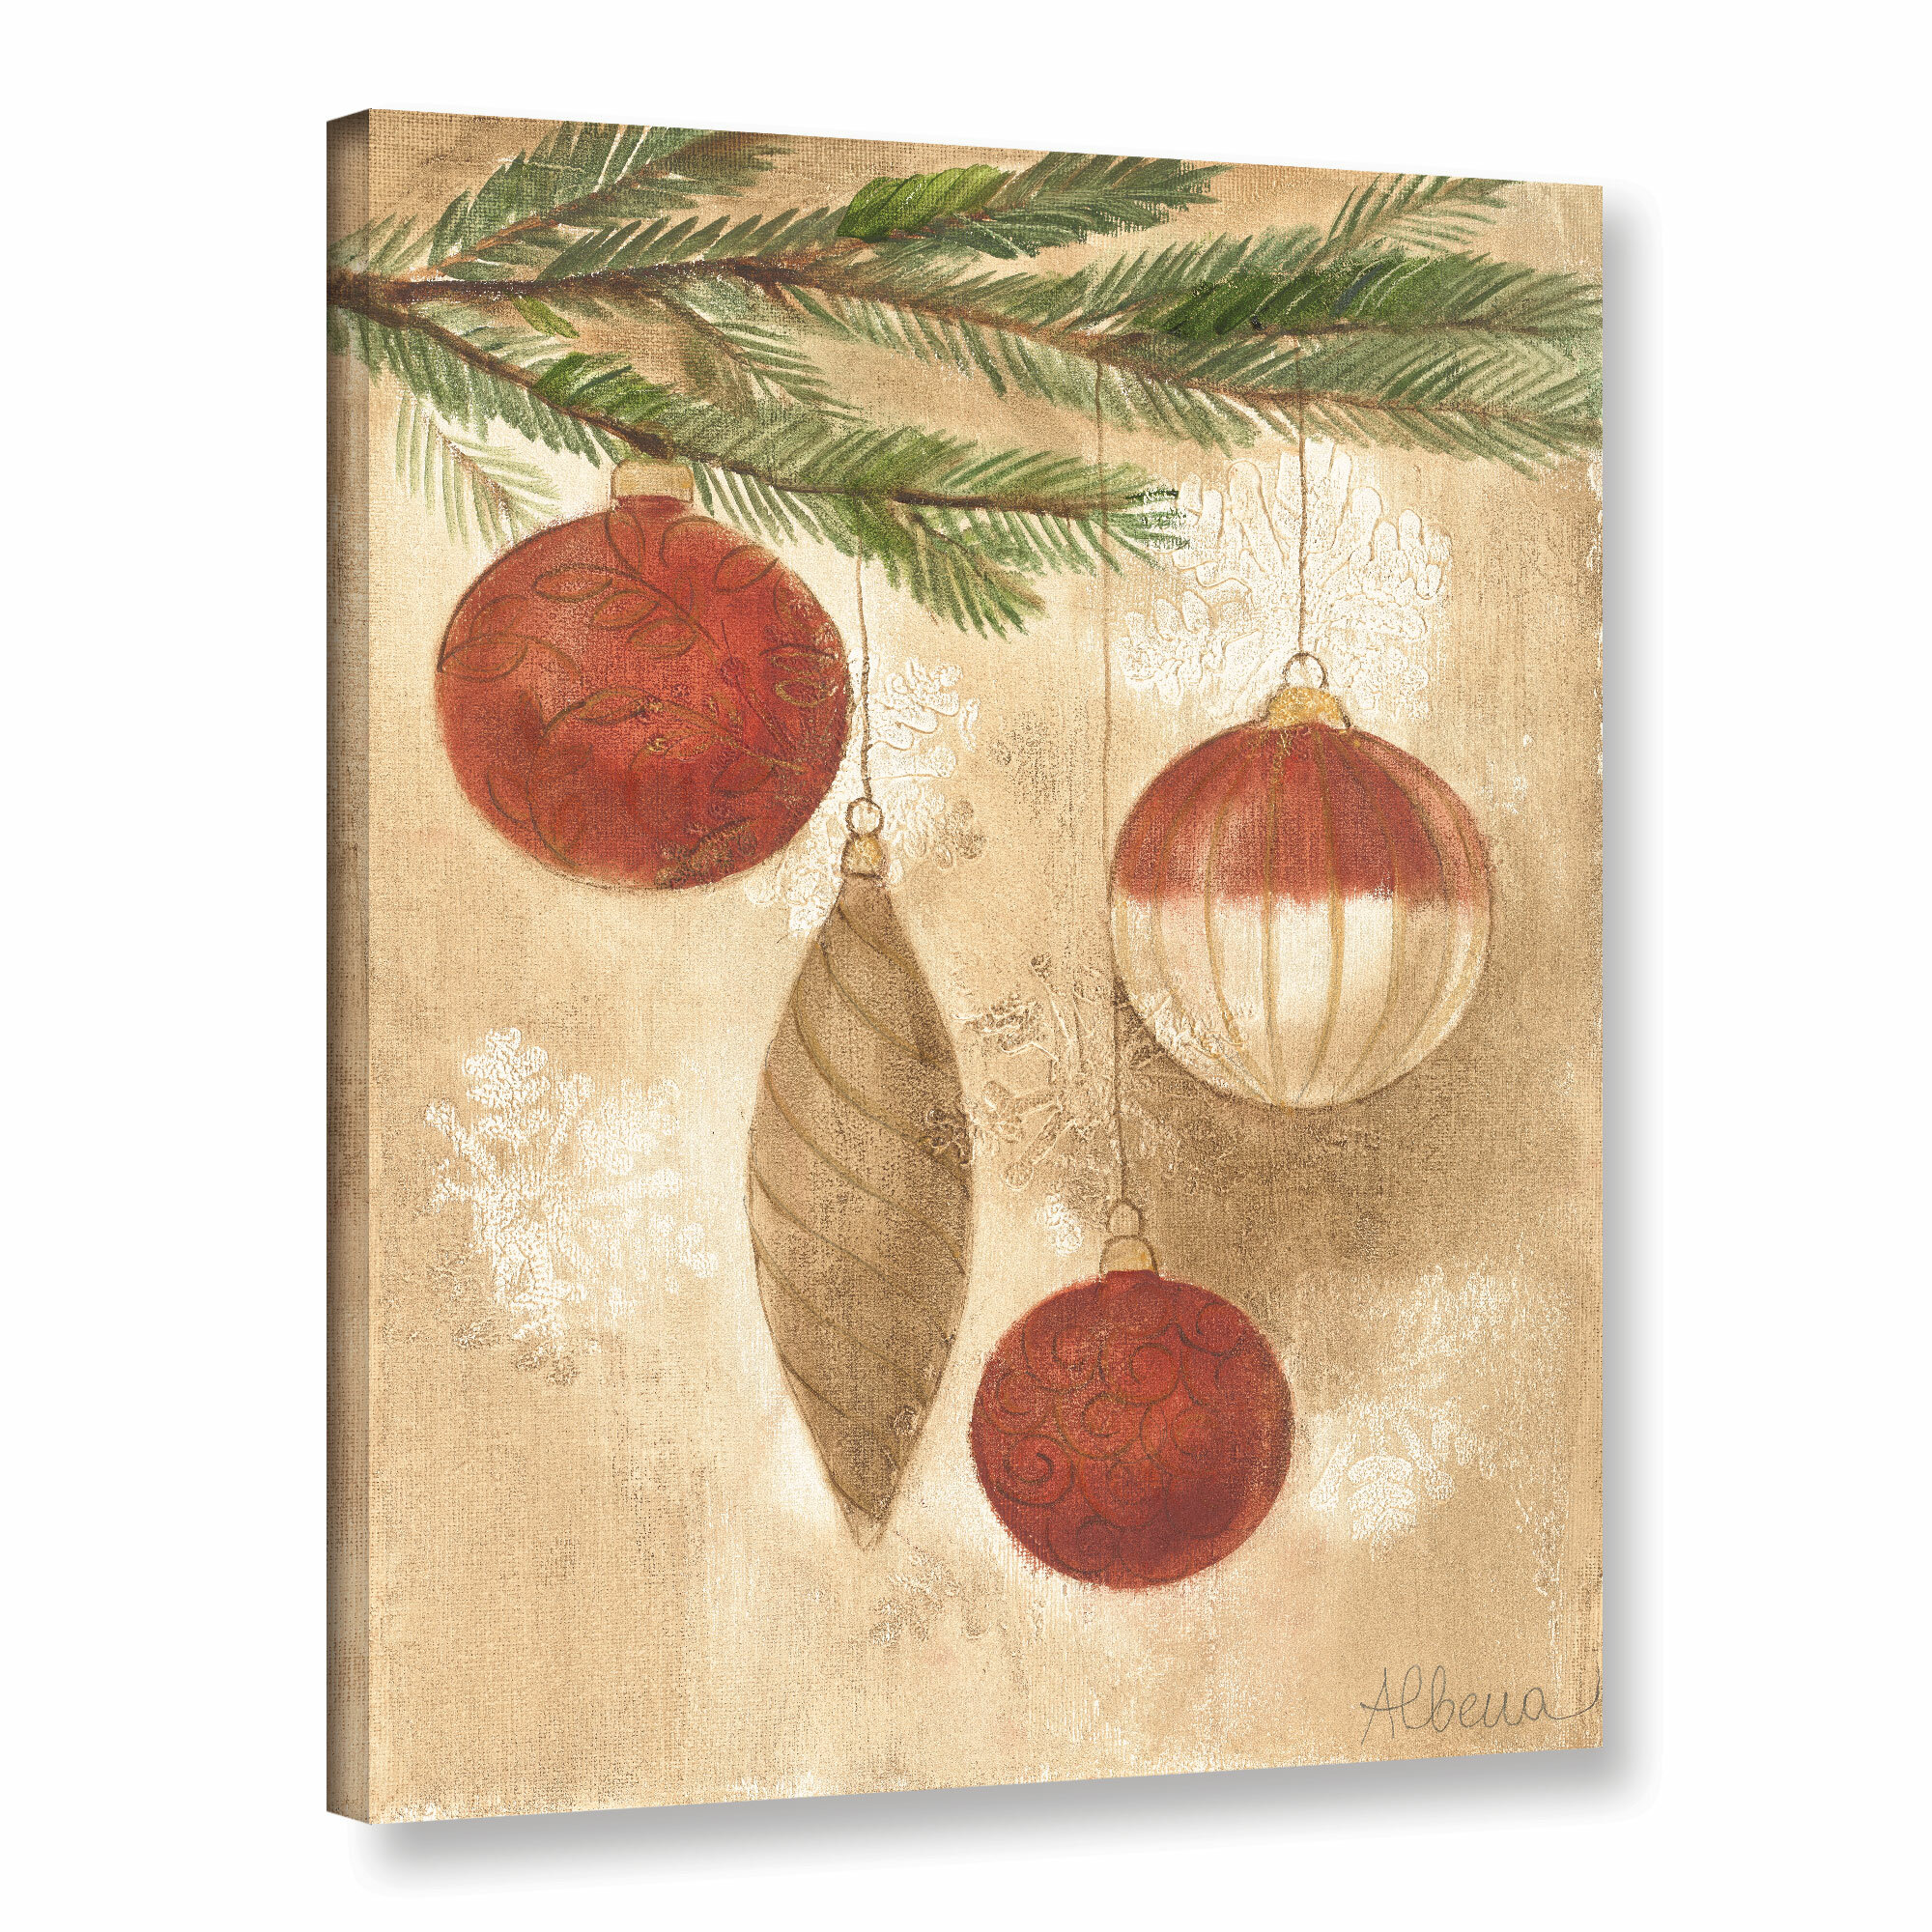 Artwall Christmas Ornaments By Albena Hristova Painting Print On Wrapped Canvas Reviews Wayfair